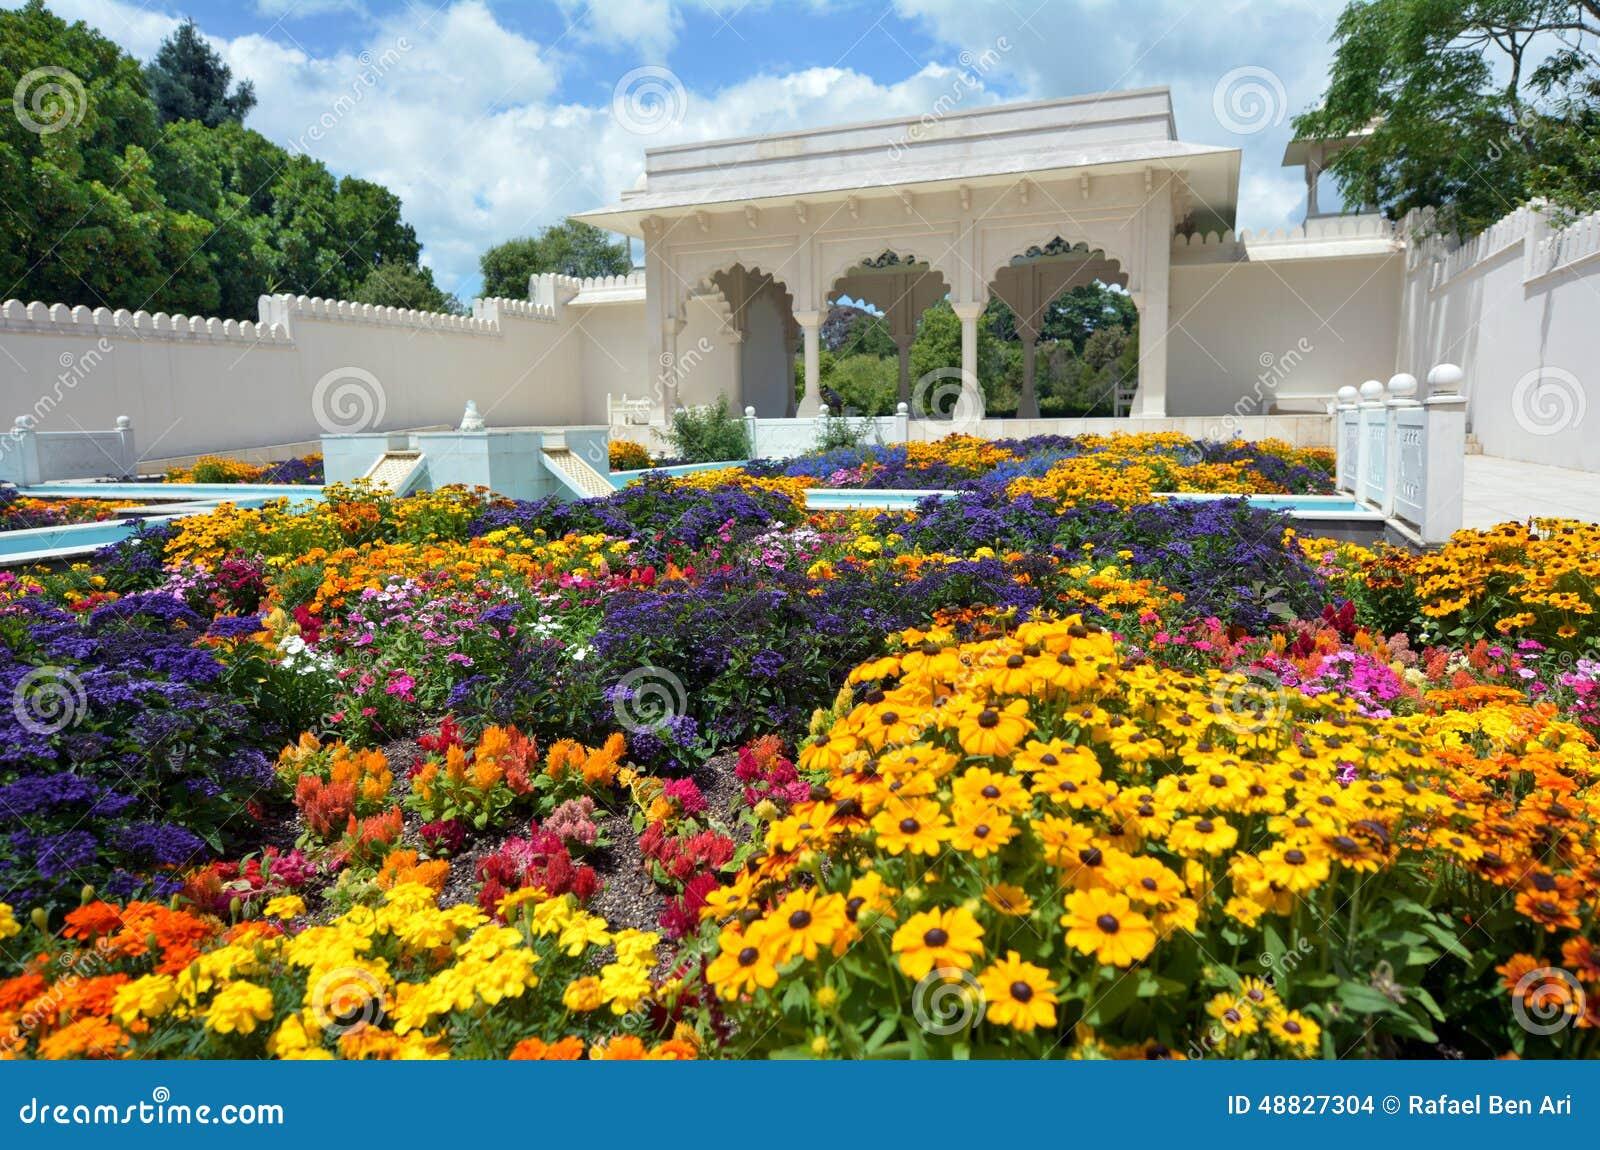 Indian Char Bagh Garden In Hamilton Gardens New Zealand